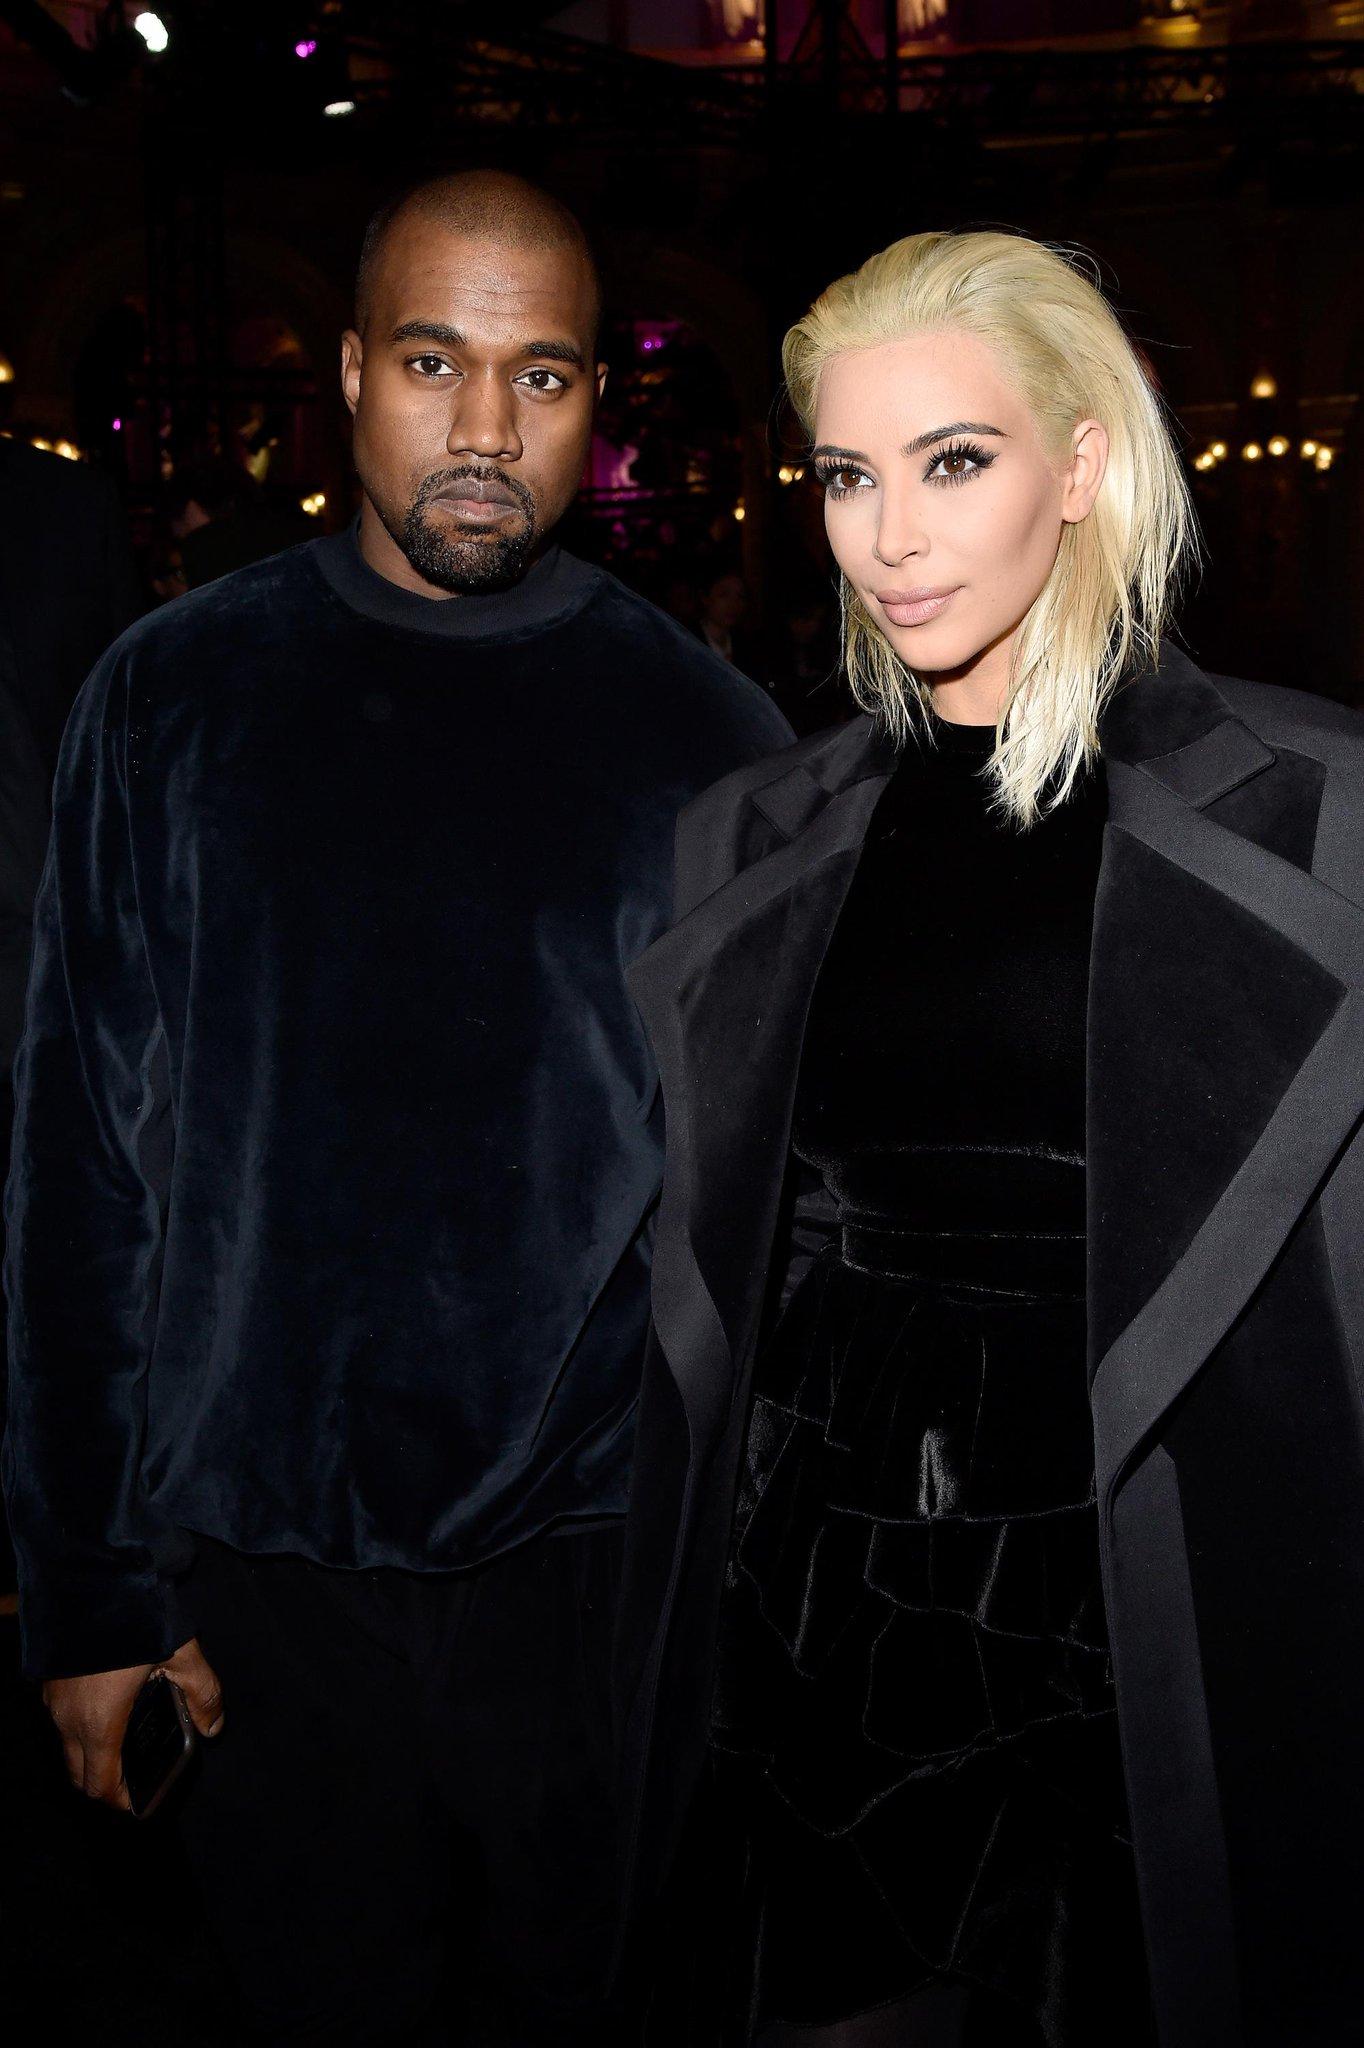 .@KimKardashian's new platinum hair steals the spotlight at @Balmain: http://t.co/340Z1o39wm #pfw http://t.co/czfpxtmsvD